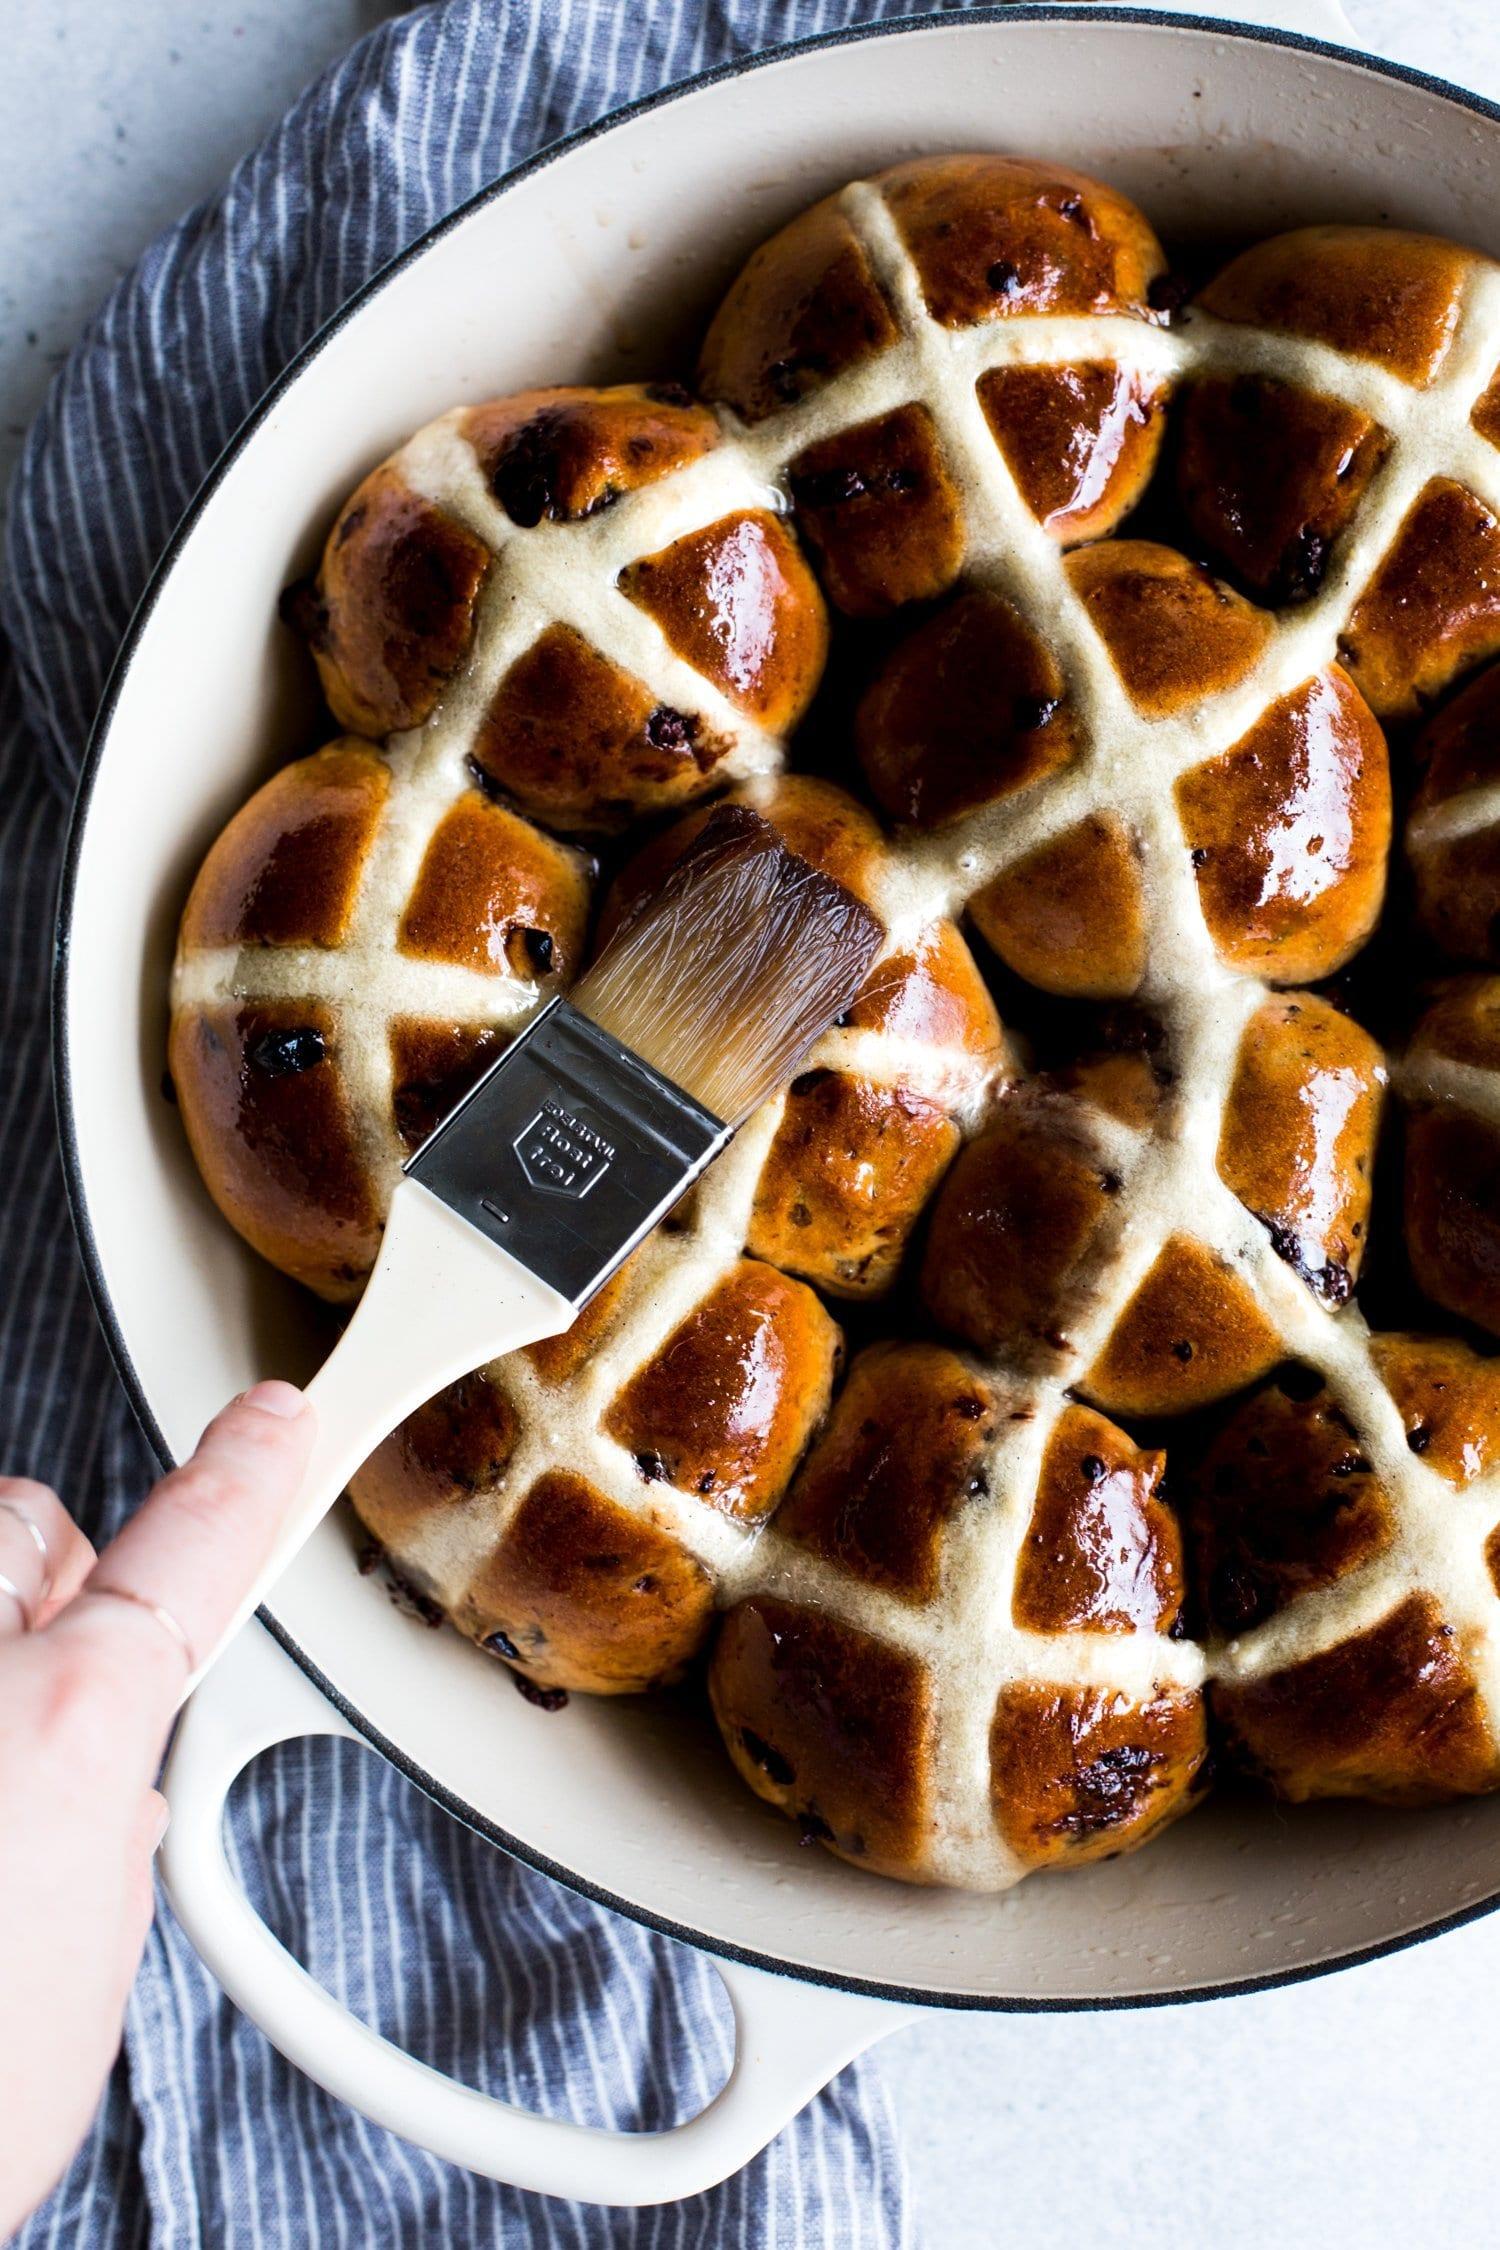 Vegan Hot Cross Buns with Dark Chocolate + Sour Cherries   The Floured Kitchen